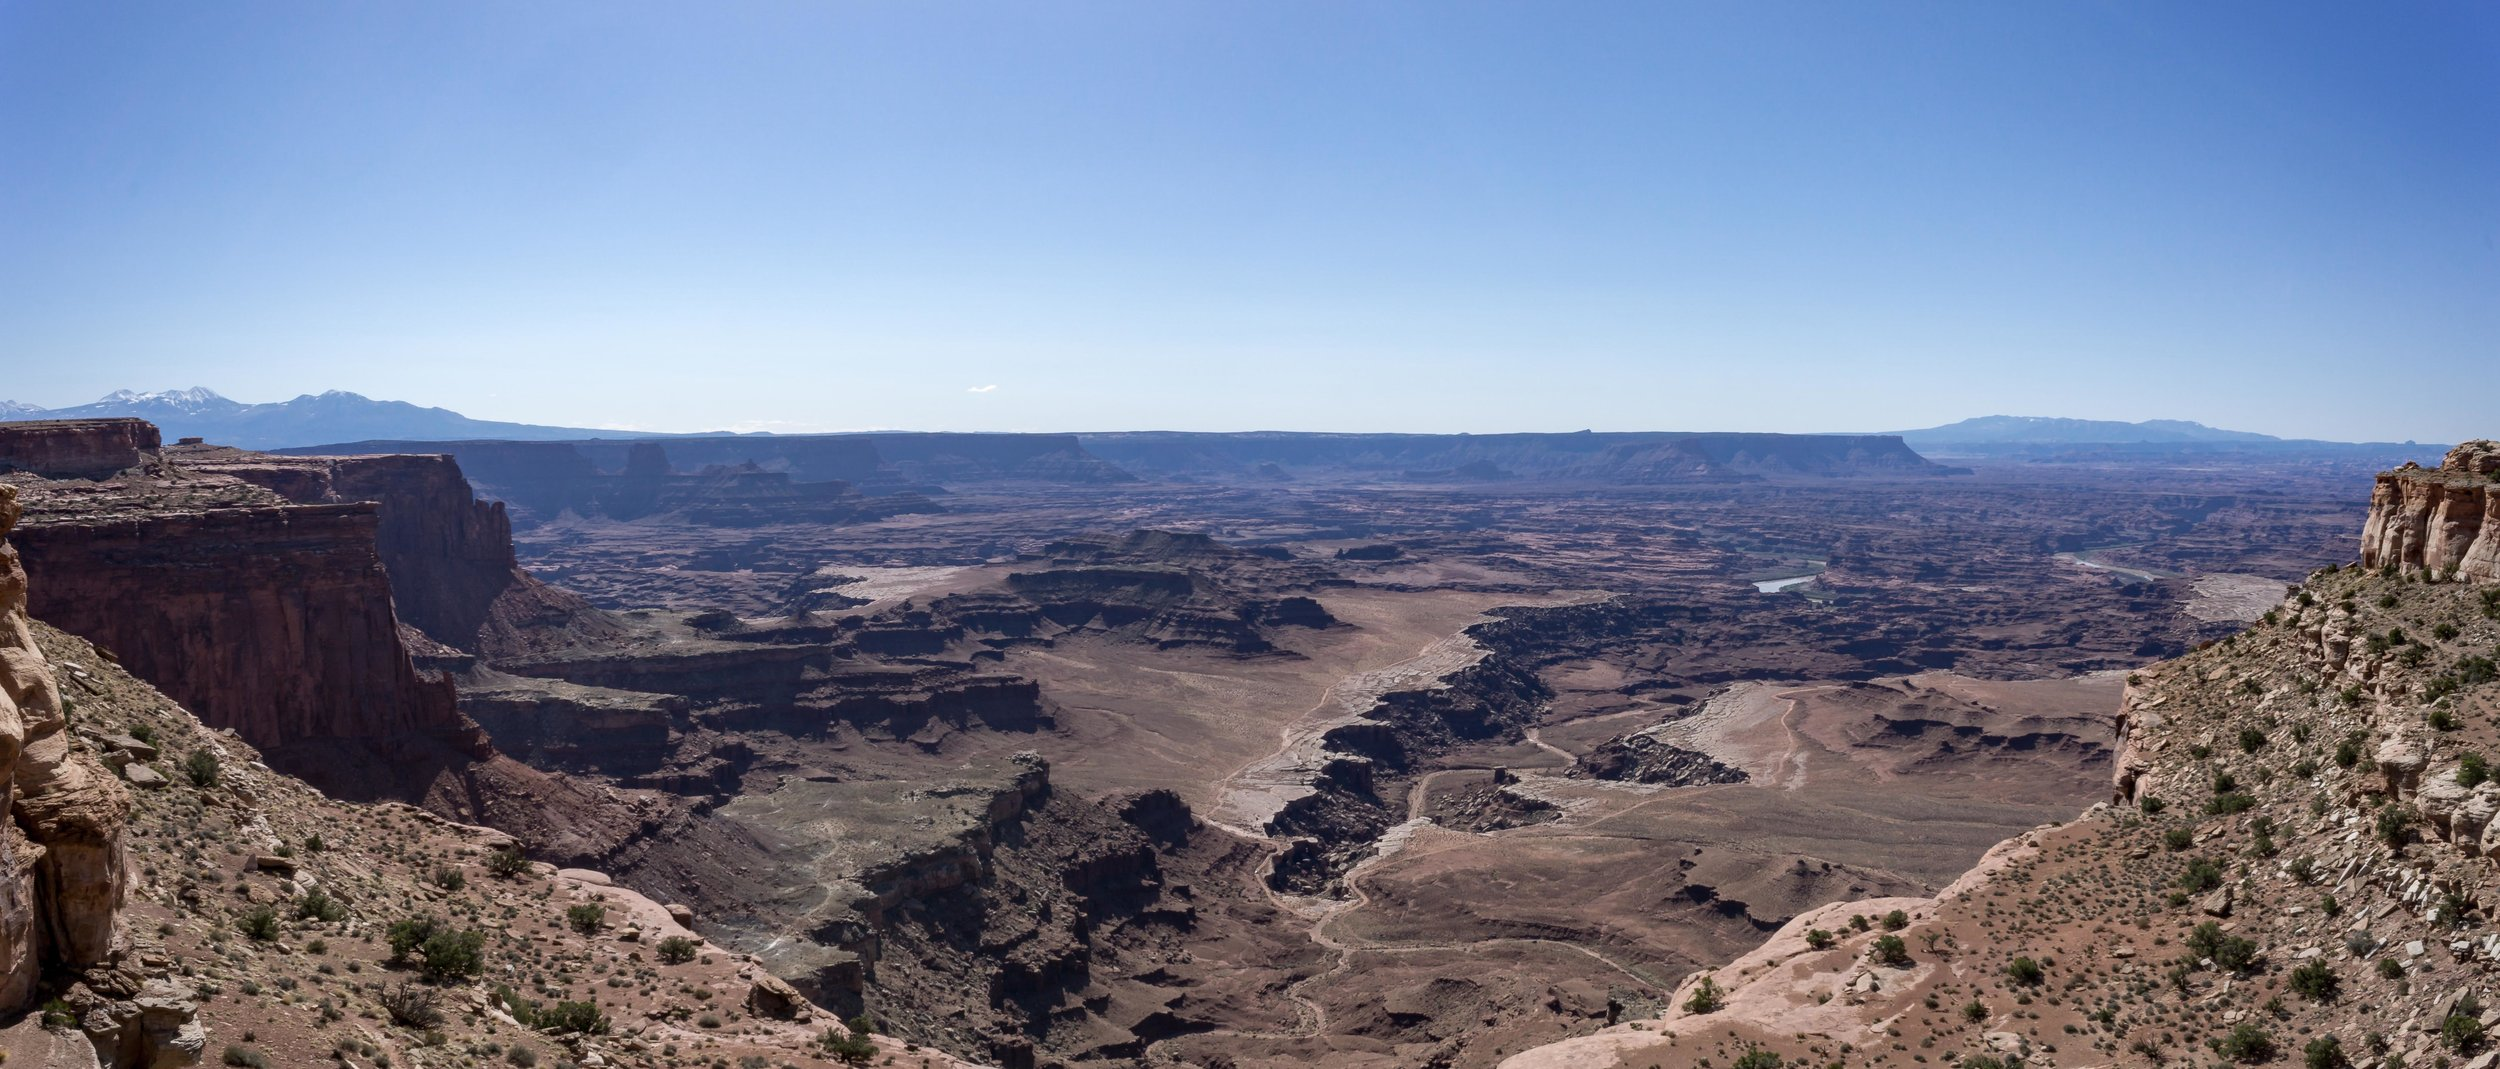 CanyonlandsApril2018-16.jpg